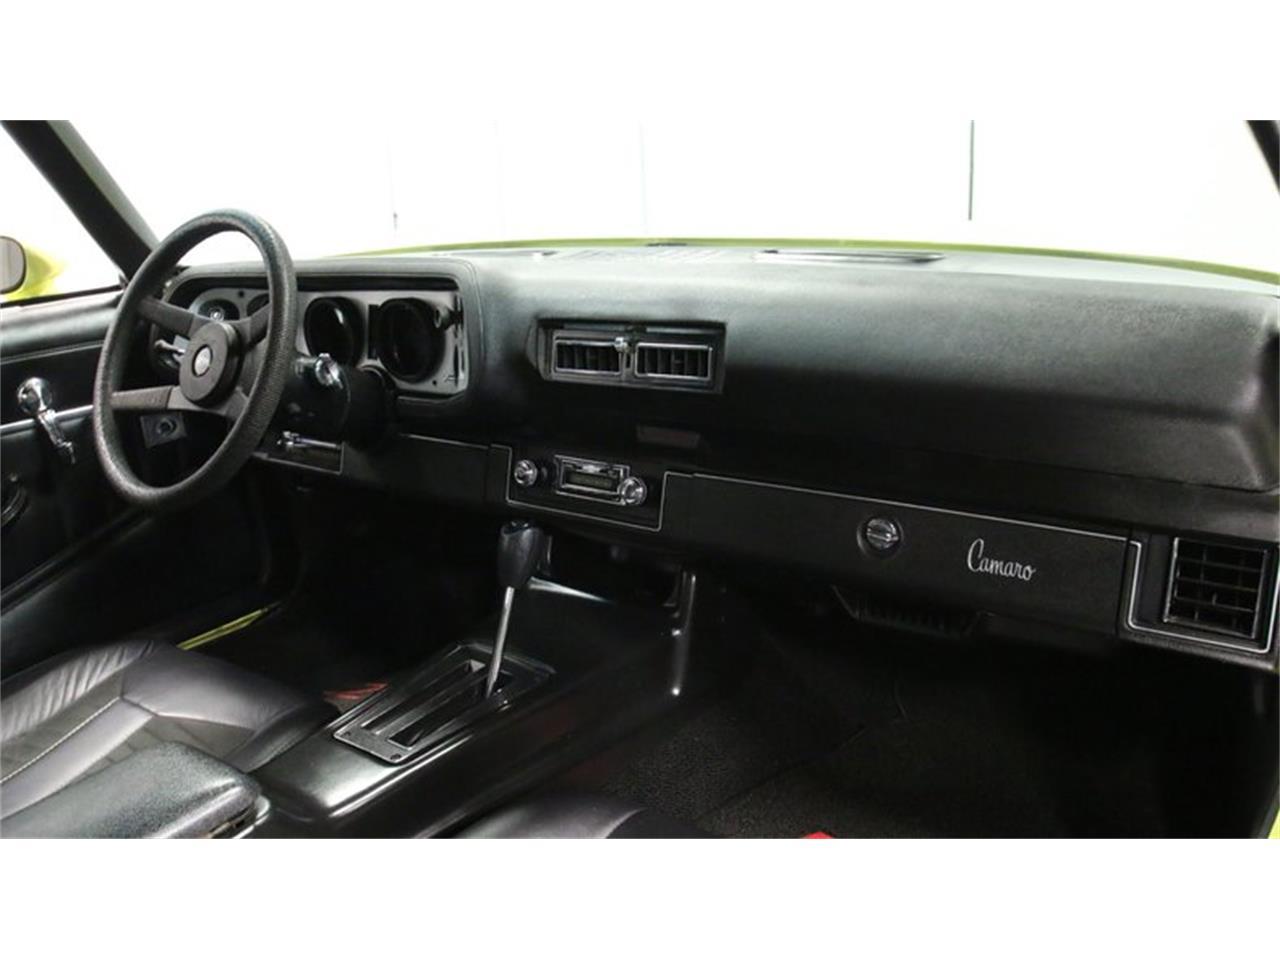 1978 Chevrolet Camaro (CC-1294666) for sale in Lithia Springs, Georgia